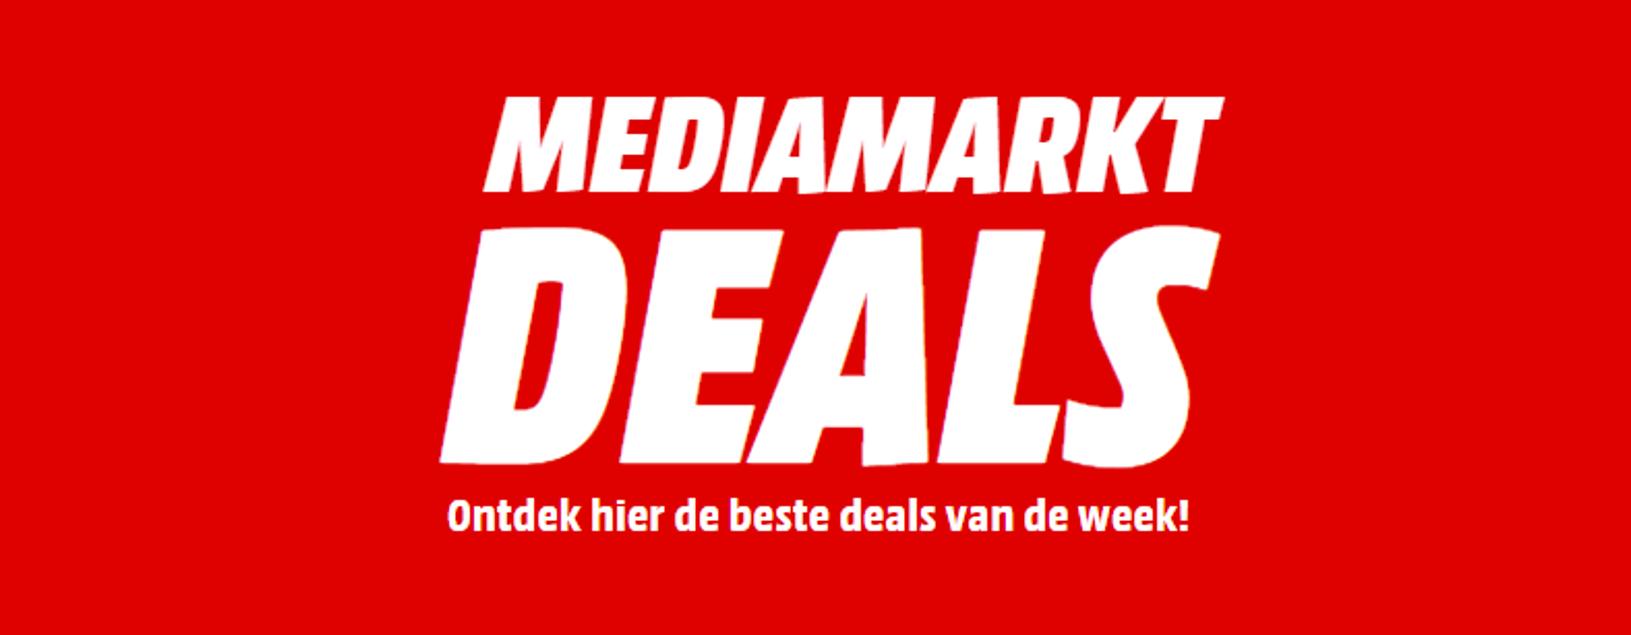 Tip: zo shop je goedkoper bij MediaMarkt!